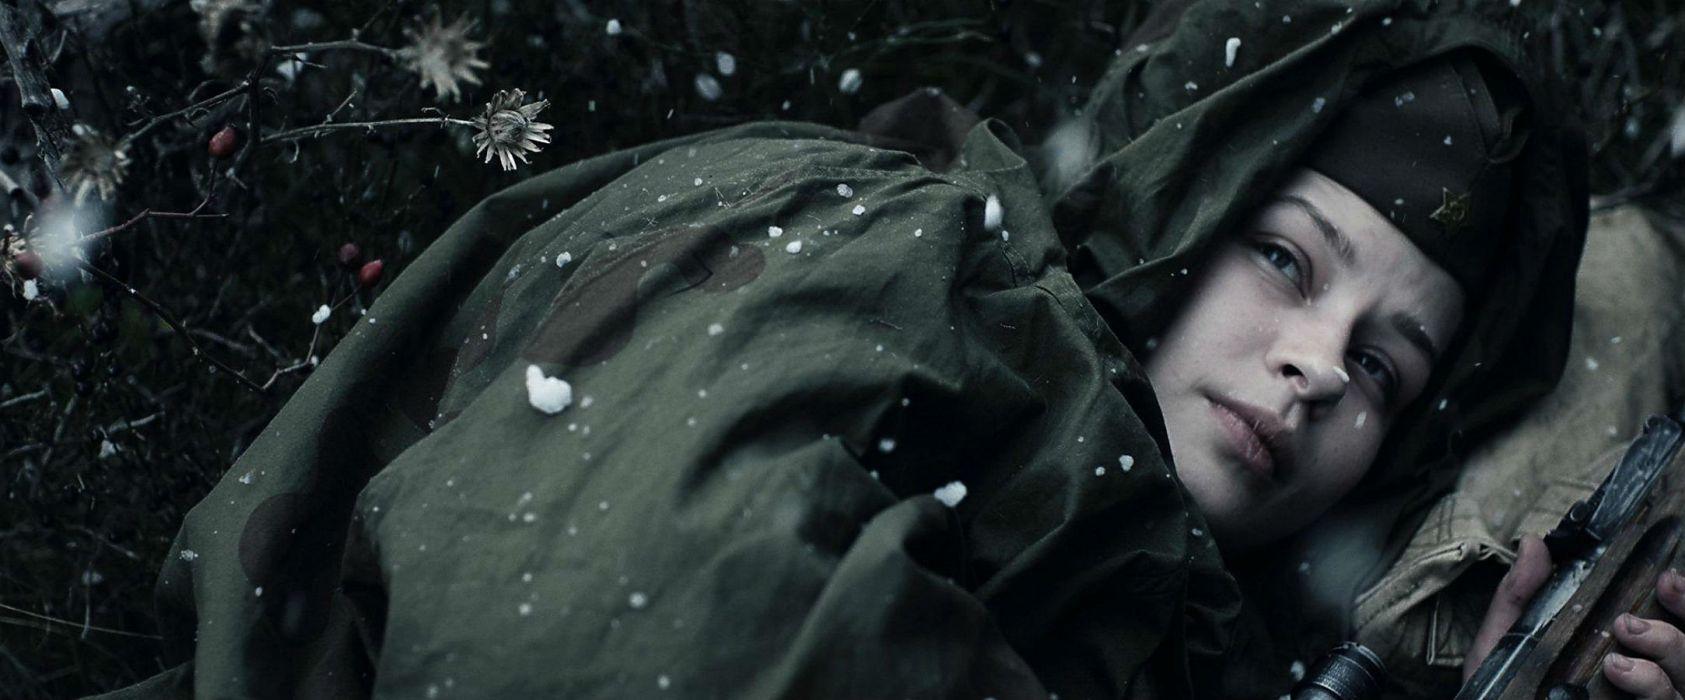 BATTLE FOR SEVASTOPOL movie film russia russian war wwll world military sniper girl woman women female 1bfs historial history action fighting drama soldier biography wallpaper